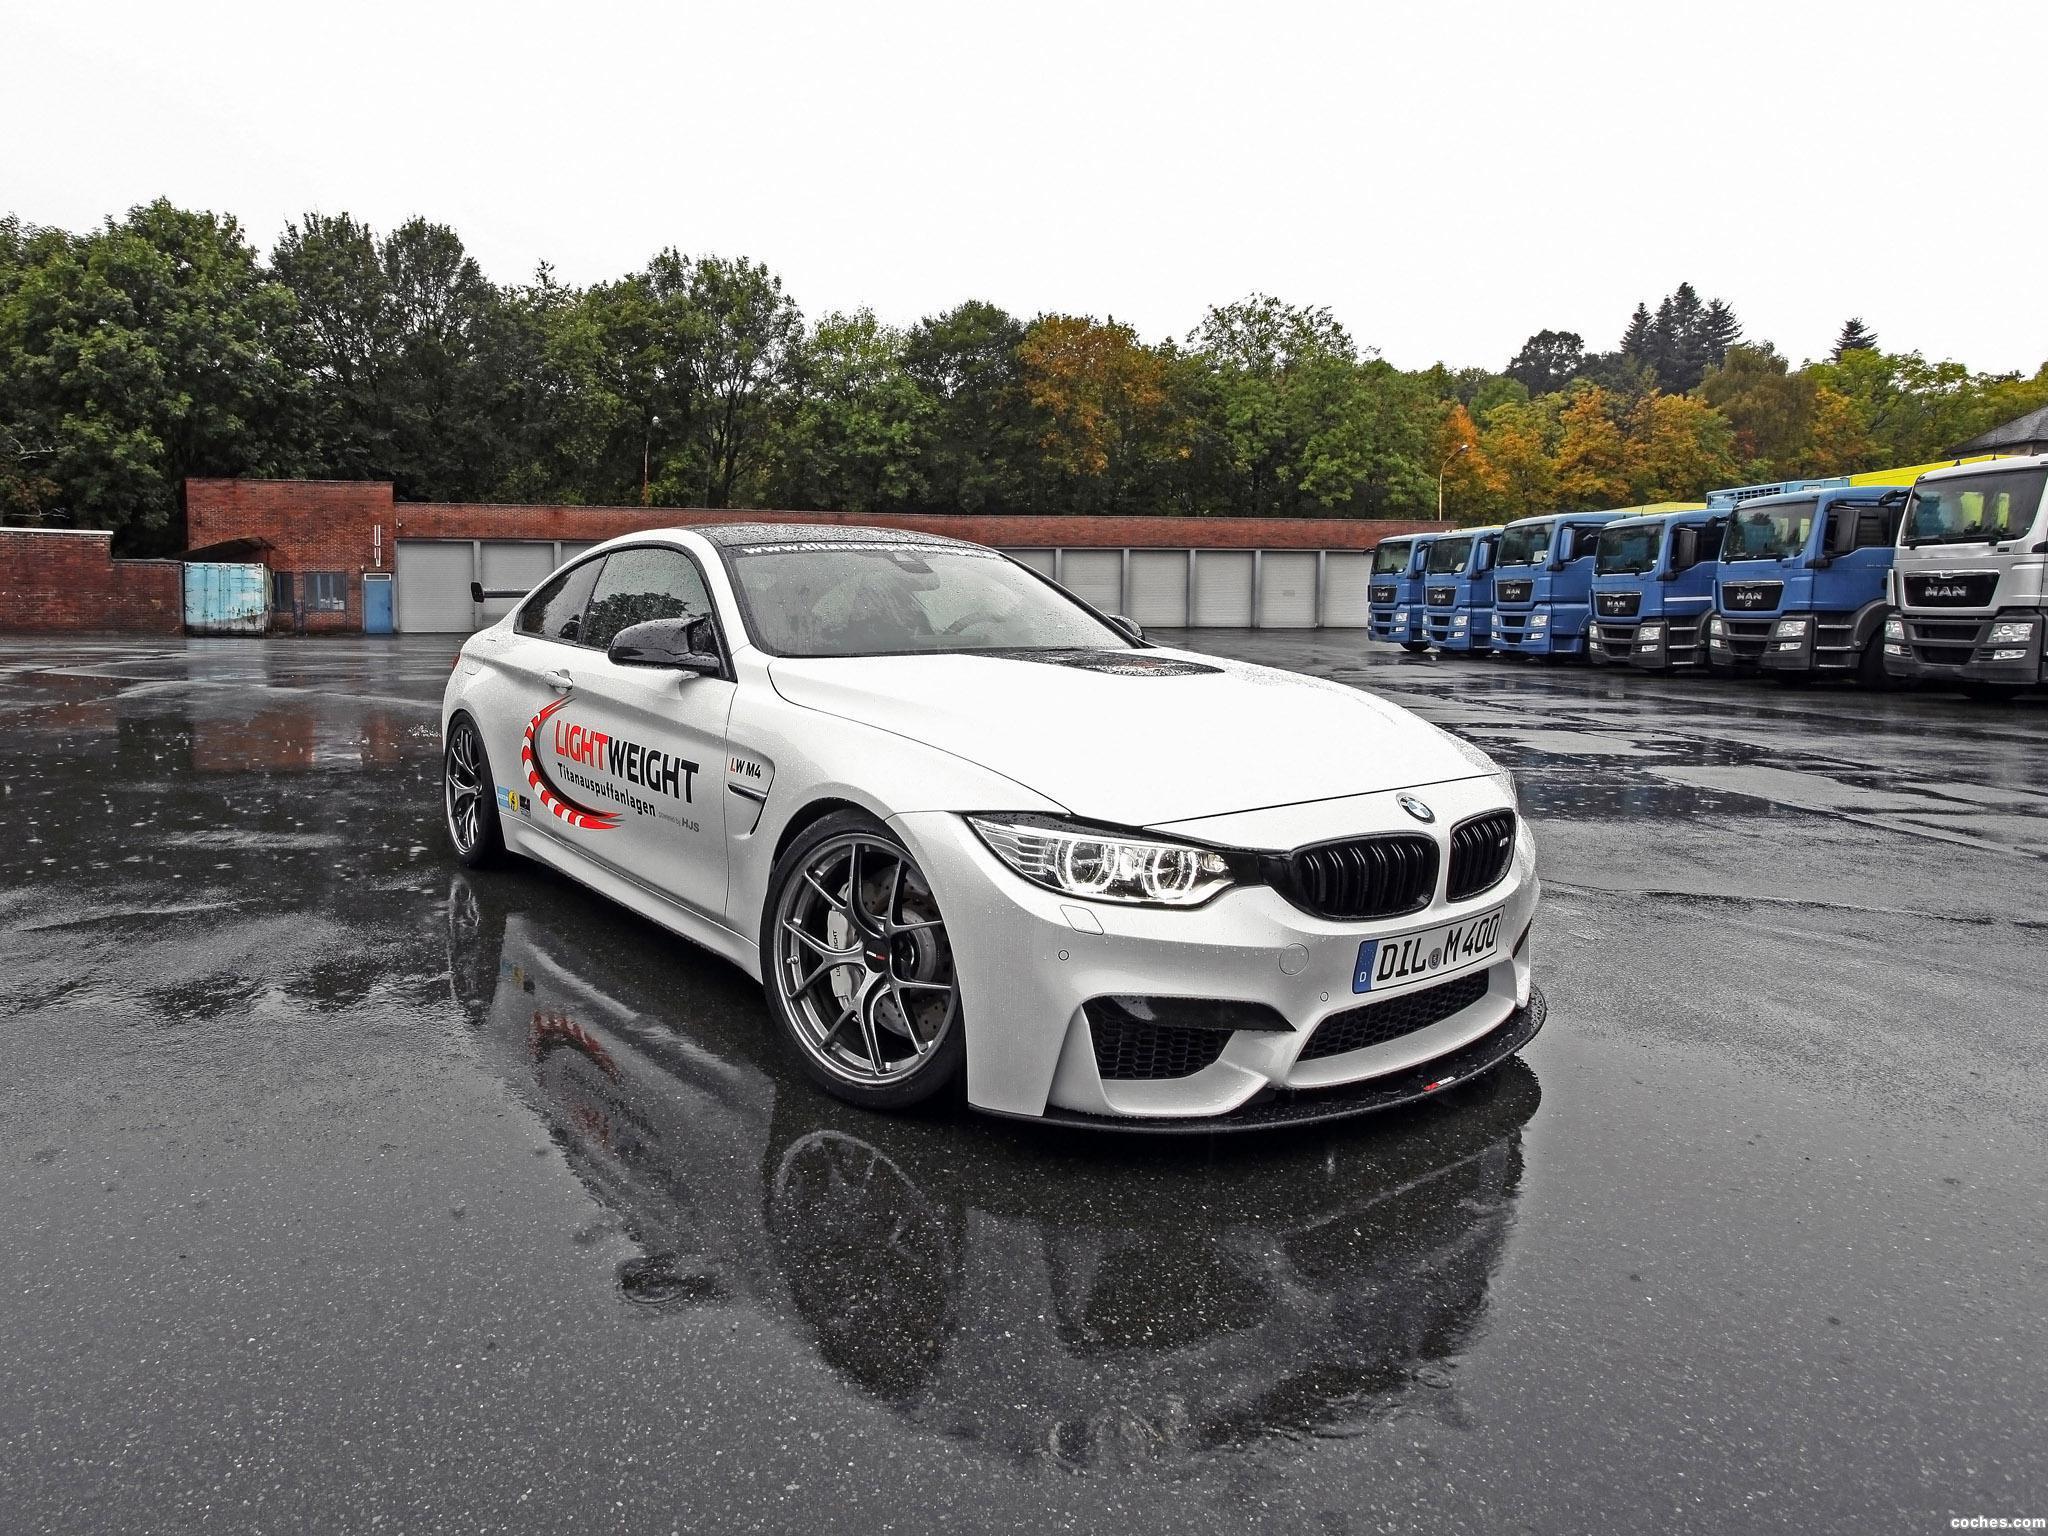 Foto 2 de BMW M4 LightWeight LW 2014